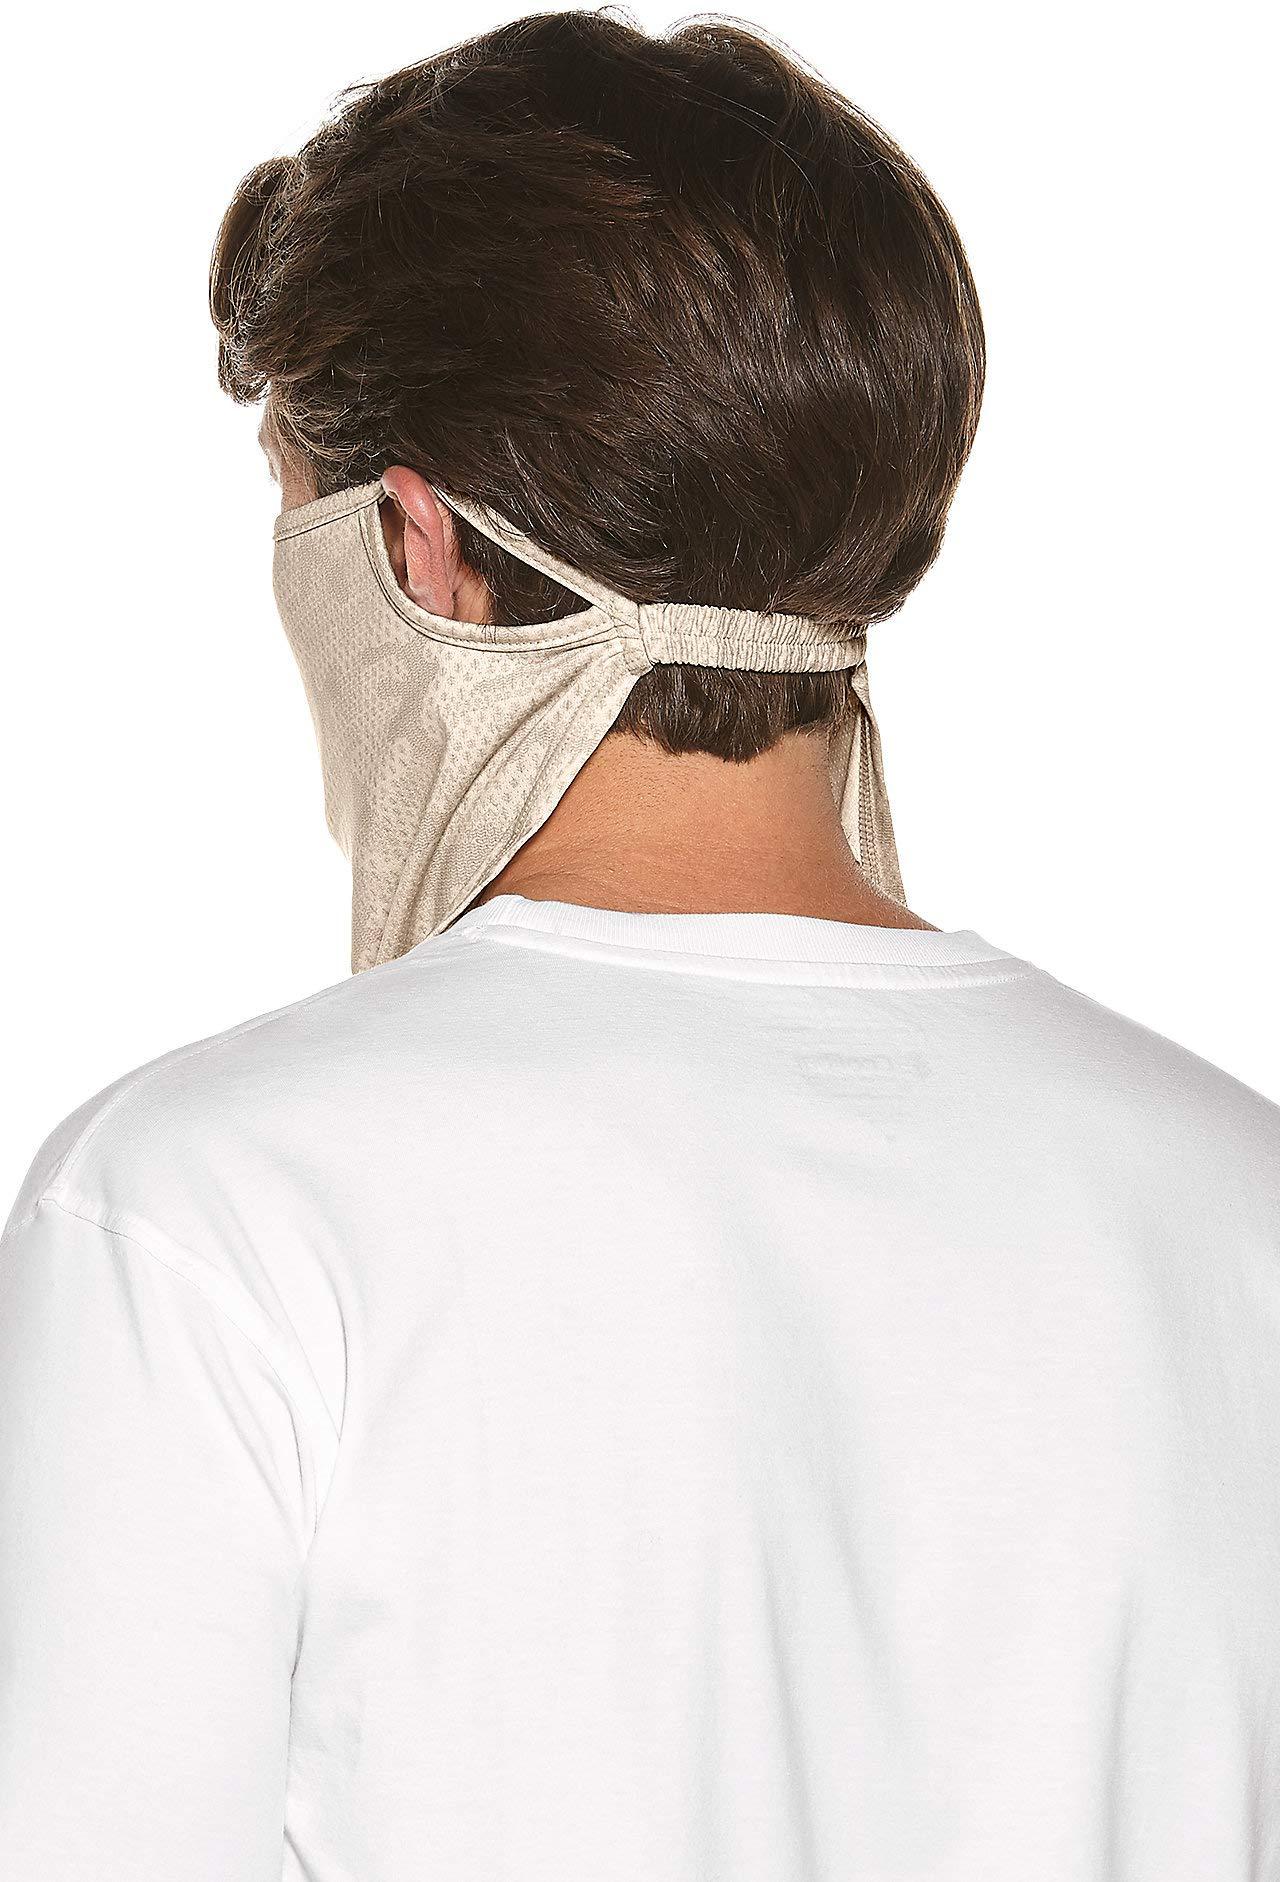 Coolibar UPF 50+ Unisex UV Face Mask - Sun Protective (Large/X-Large- Tan Coolibar Camo) by Coolibar (Image #3)